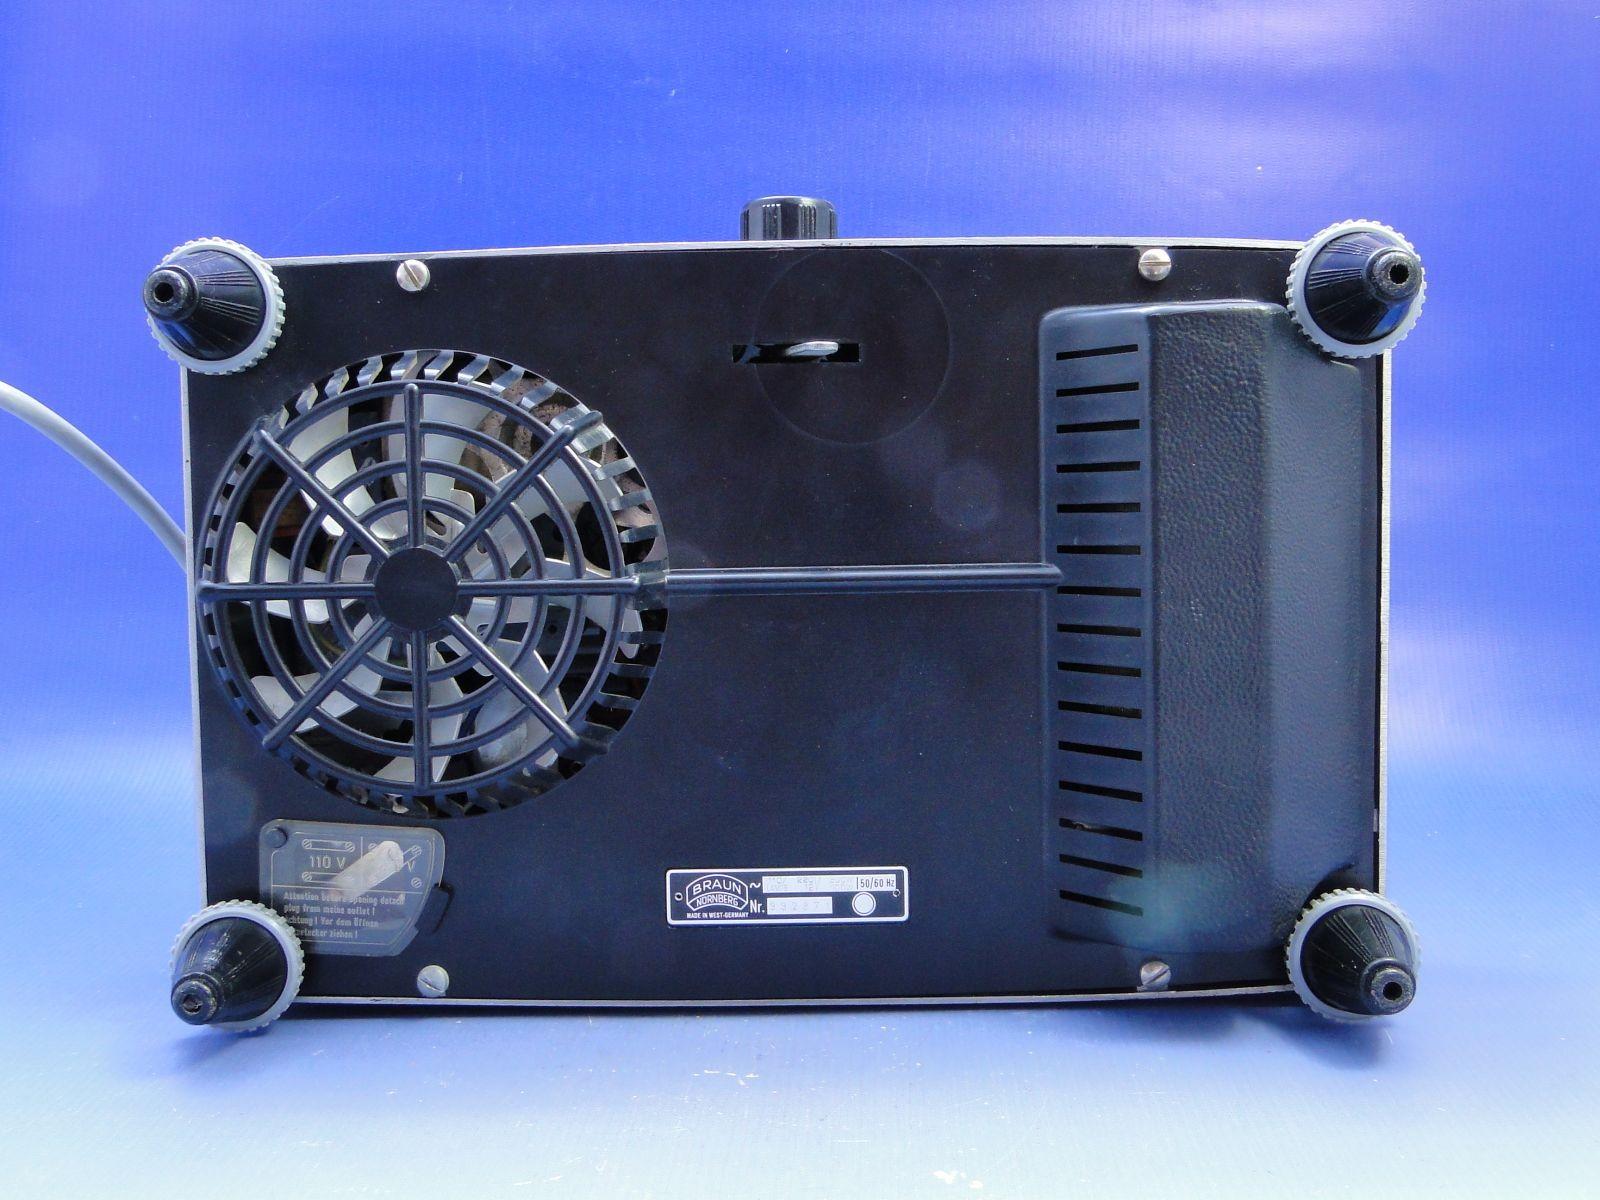 DSC01007.JPG (1600×1200)